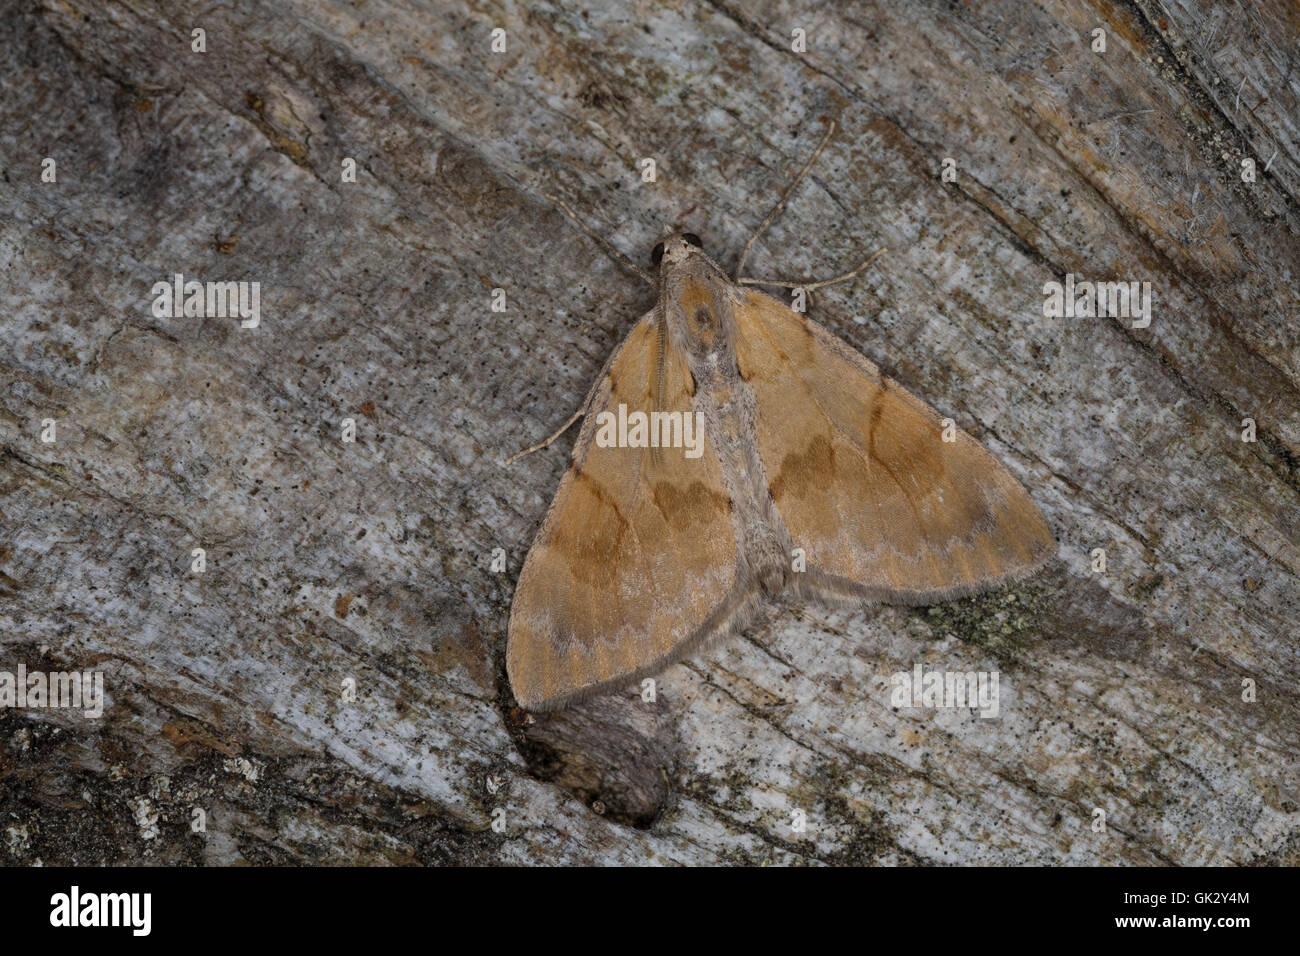 Herbst-Kiefern-Nadelholzspanner, Herbst-Kiefernnadelholzspanner, Herbst-Kiefernadelholz-Spanner, Violettgrauer Kiefern - Stock Image